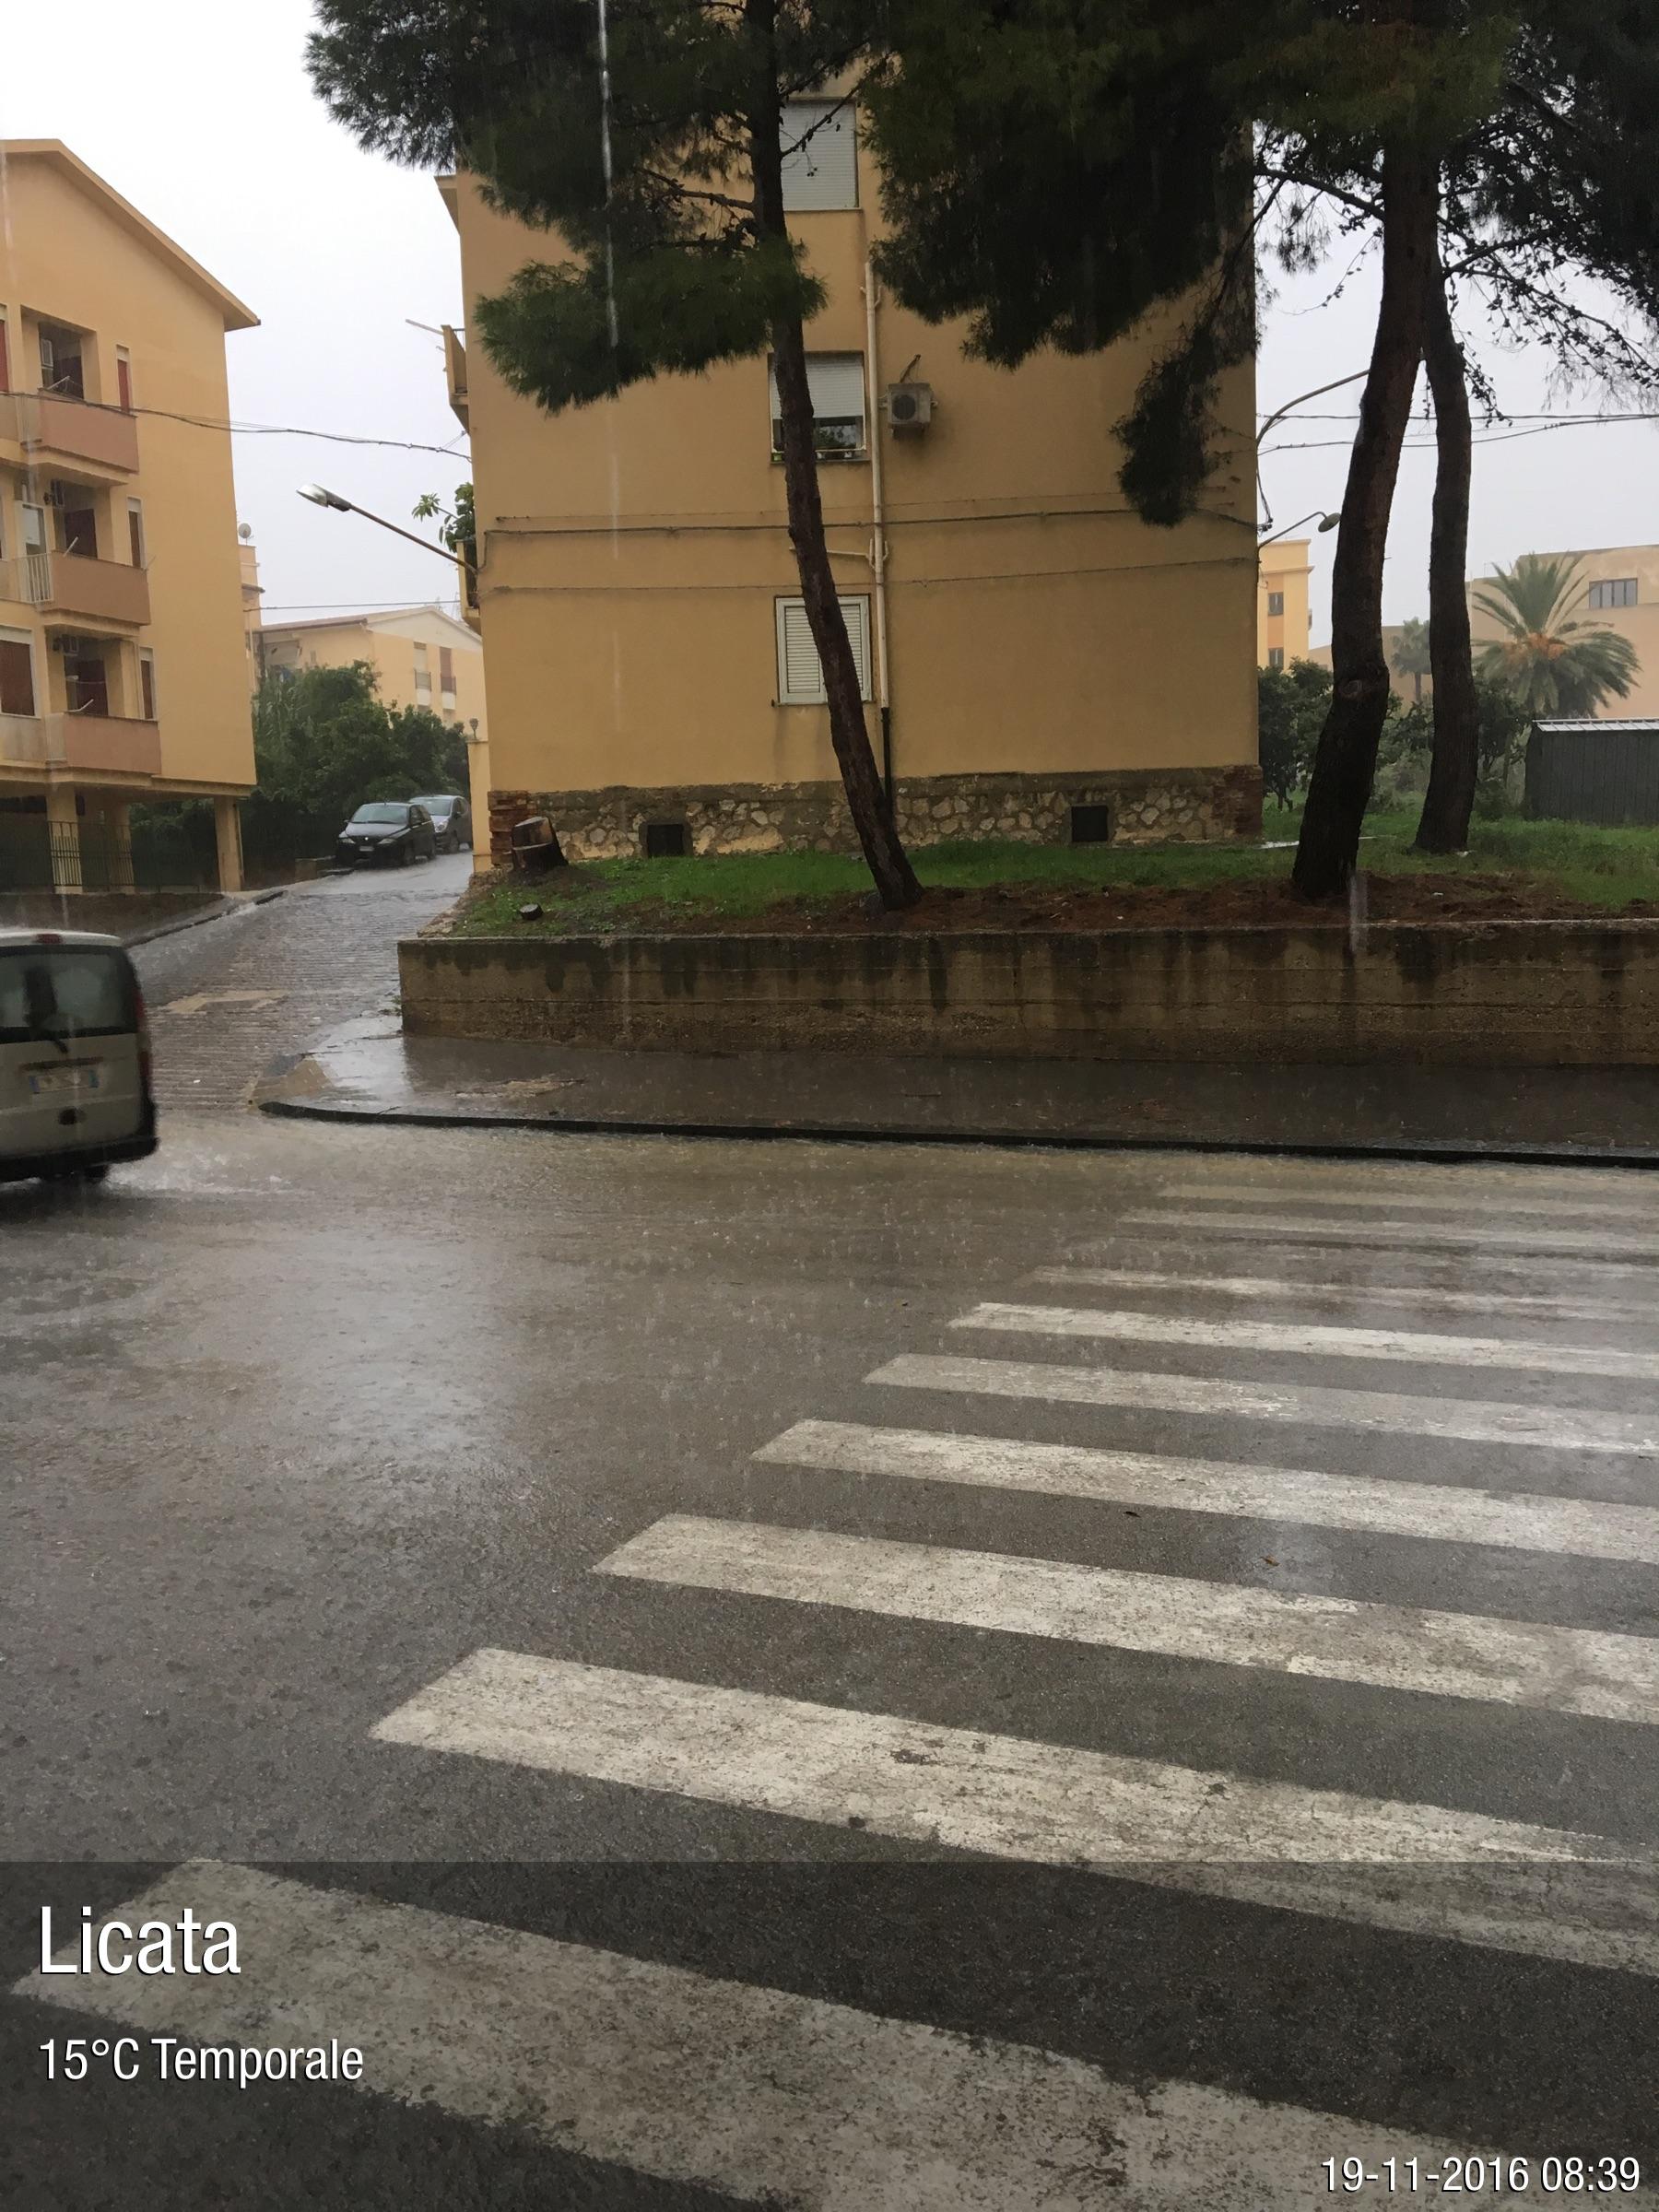 Foto meteo licata licata ore 8 39 for Meteo palma di montechiaro